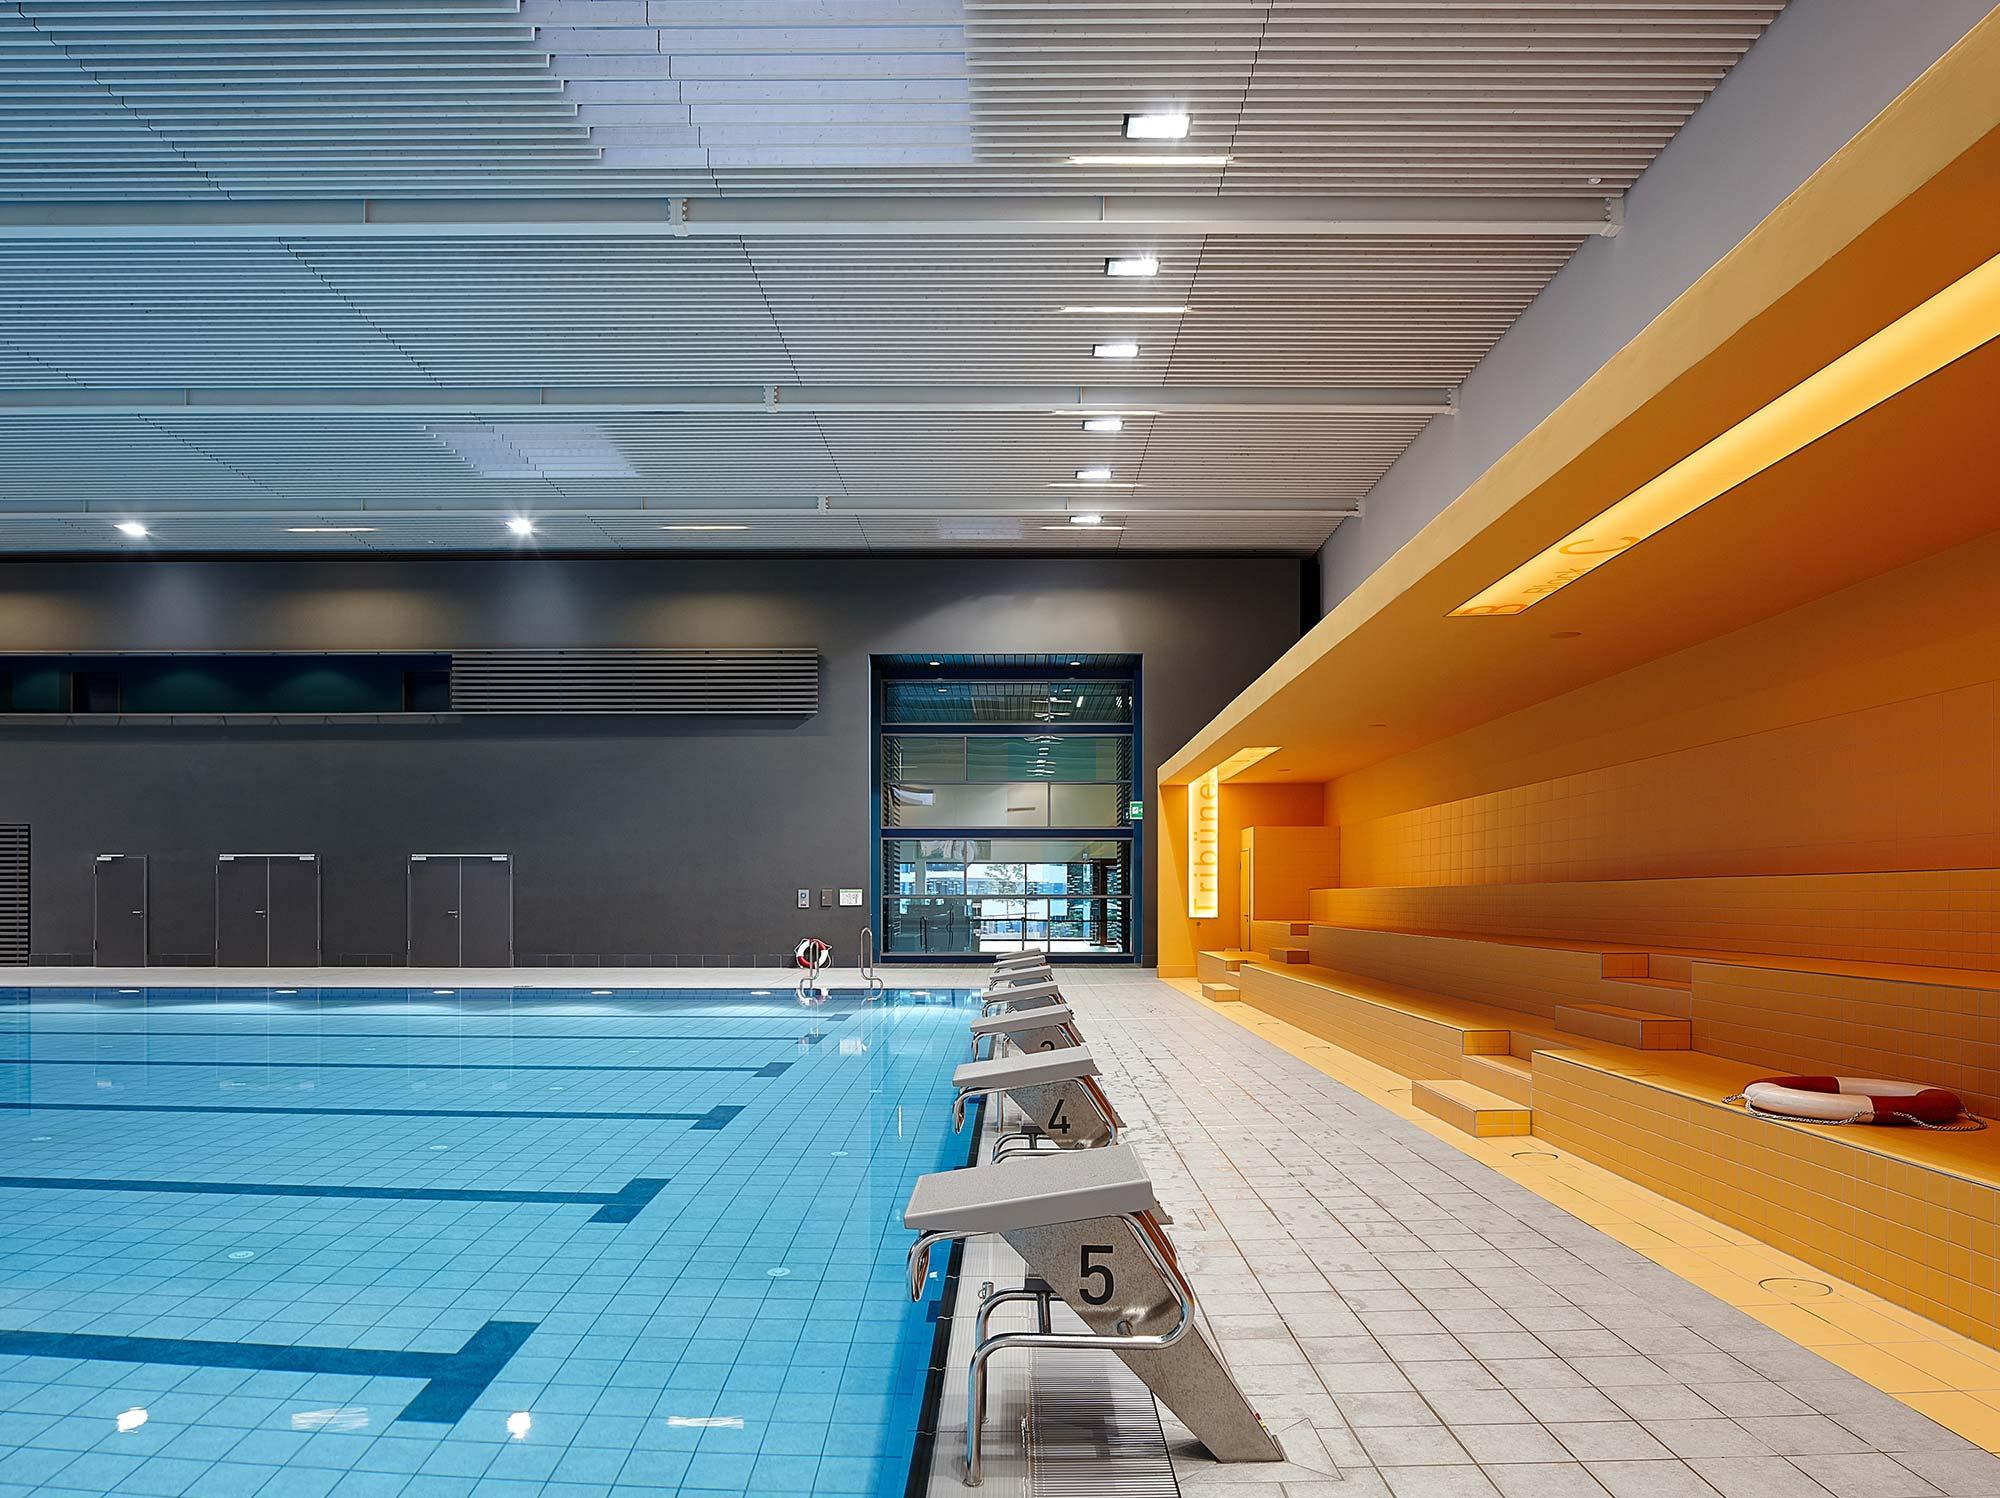 Aluminiumzargen im Schwimmbad